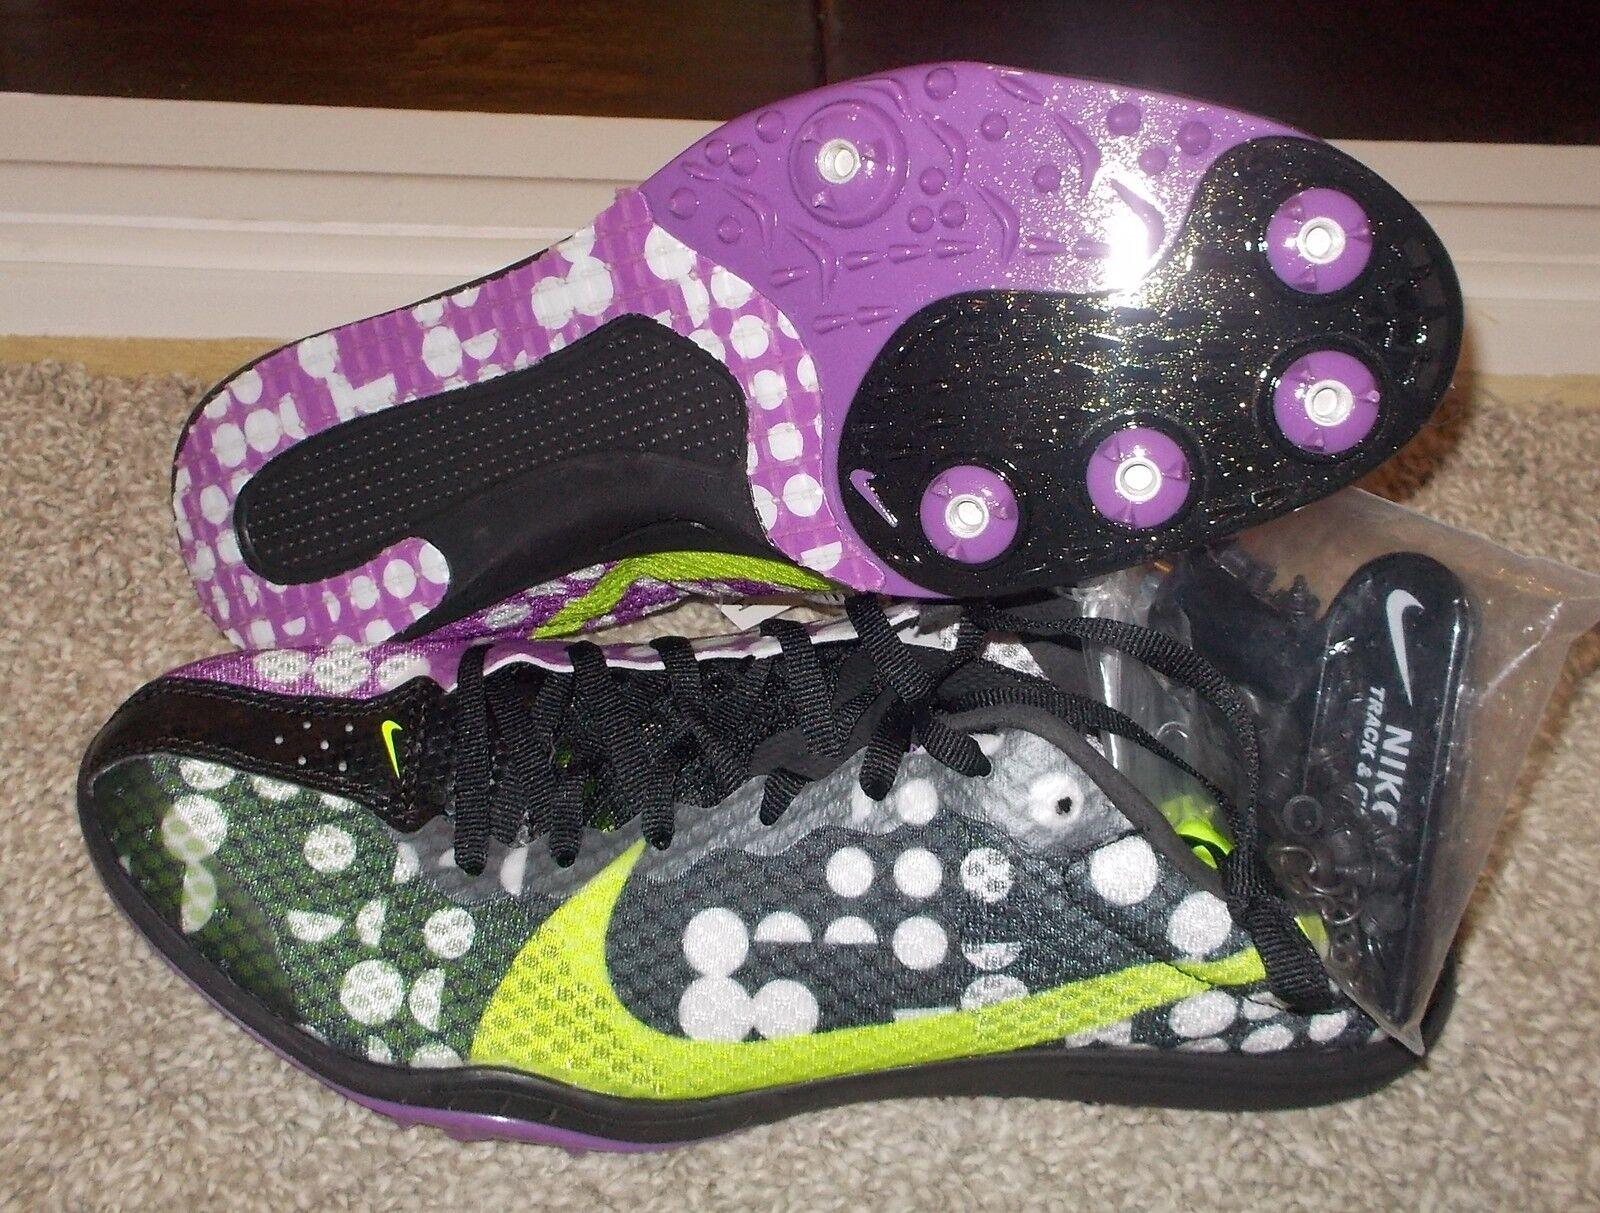 Nueva Nike Zoom Track volt074 & Field mujer Negro volt074 Track 075 bb8509